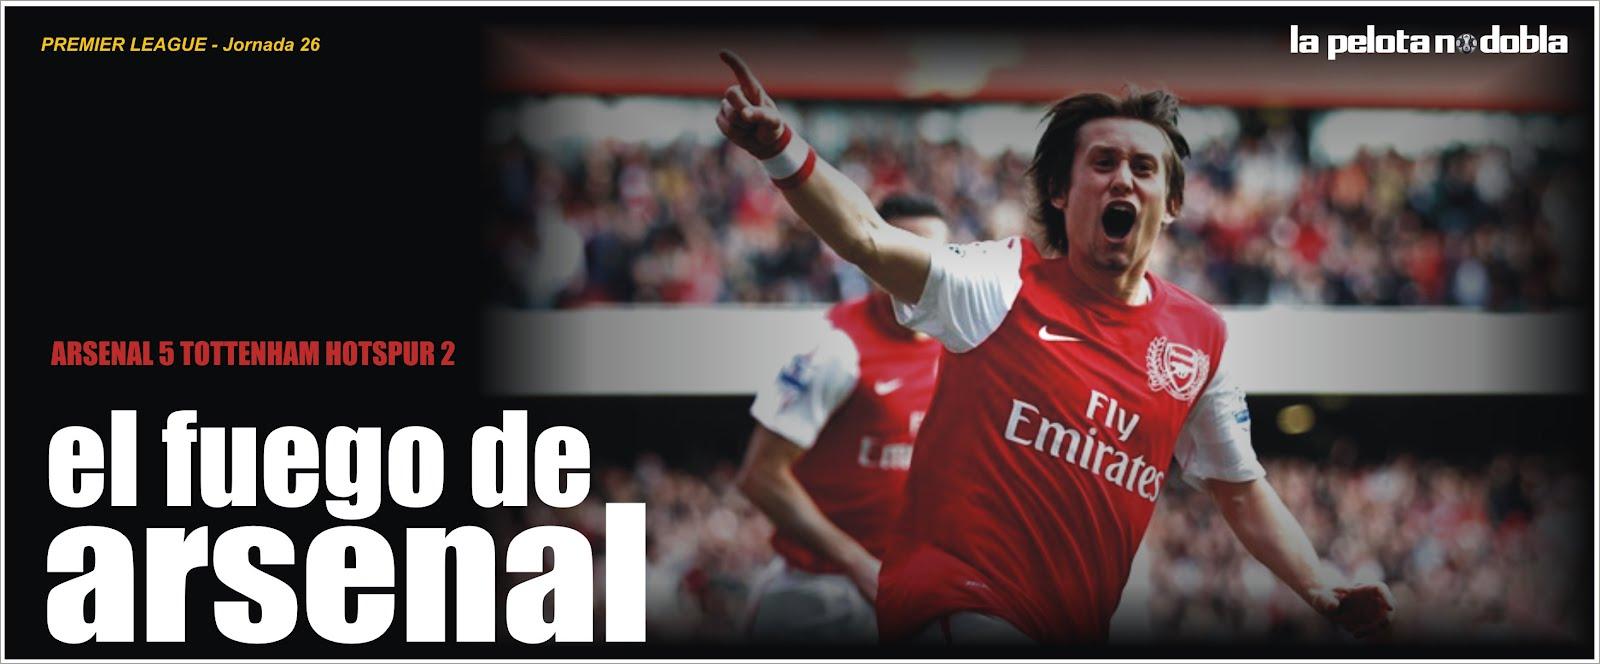 [N] El Arsenal le da vuelta un partidazo al Totenham